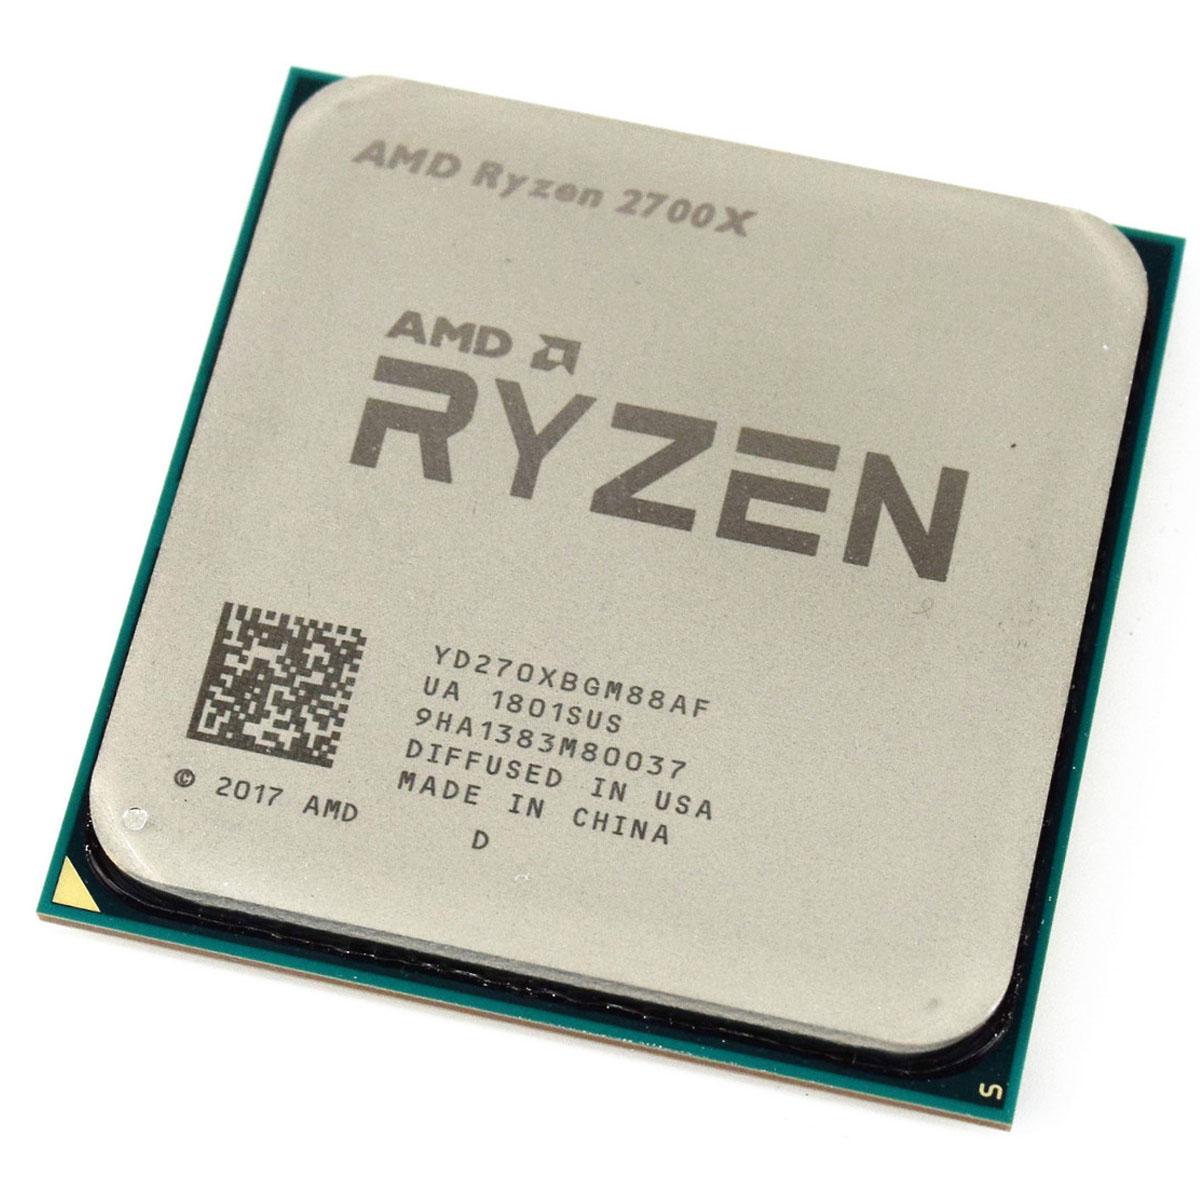 AMD Ryzen 7 2700X CPU Processor 8Core 4 3GHz 16MB TDP 105W Cache 14nm DDR4  2667MHZ r7 2700x Desktop